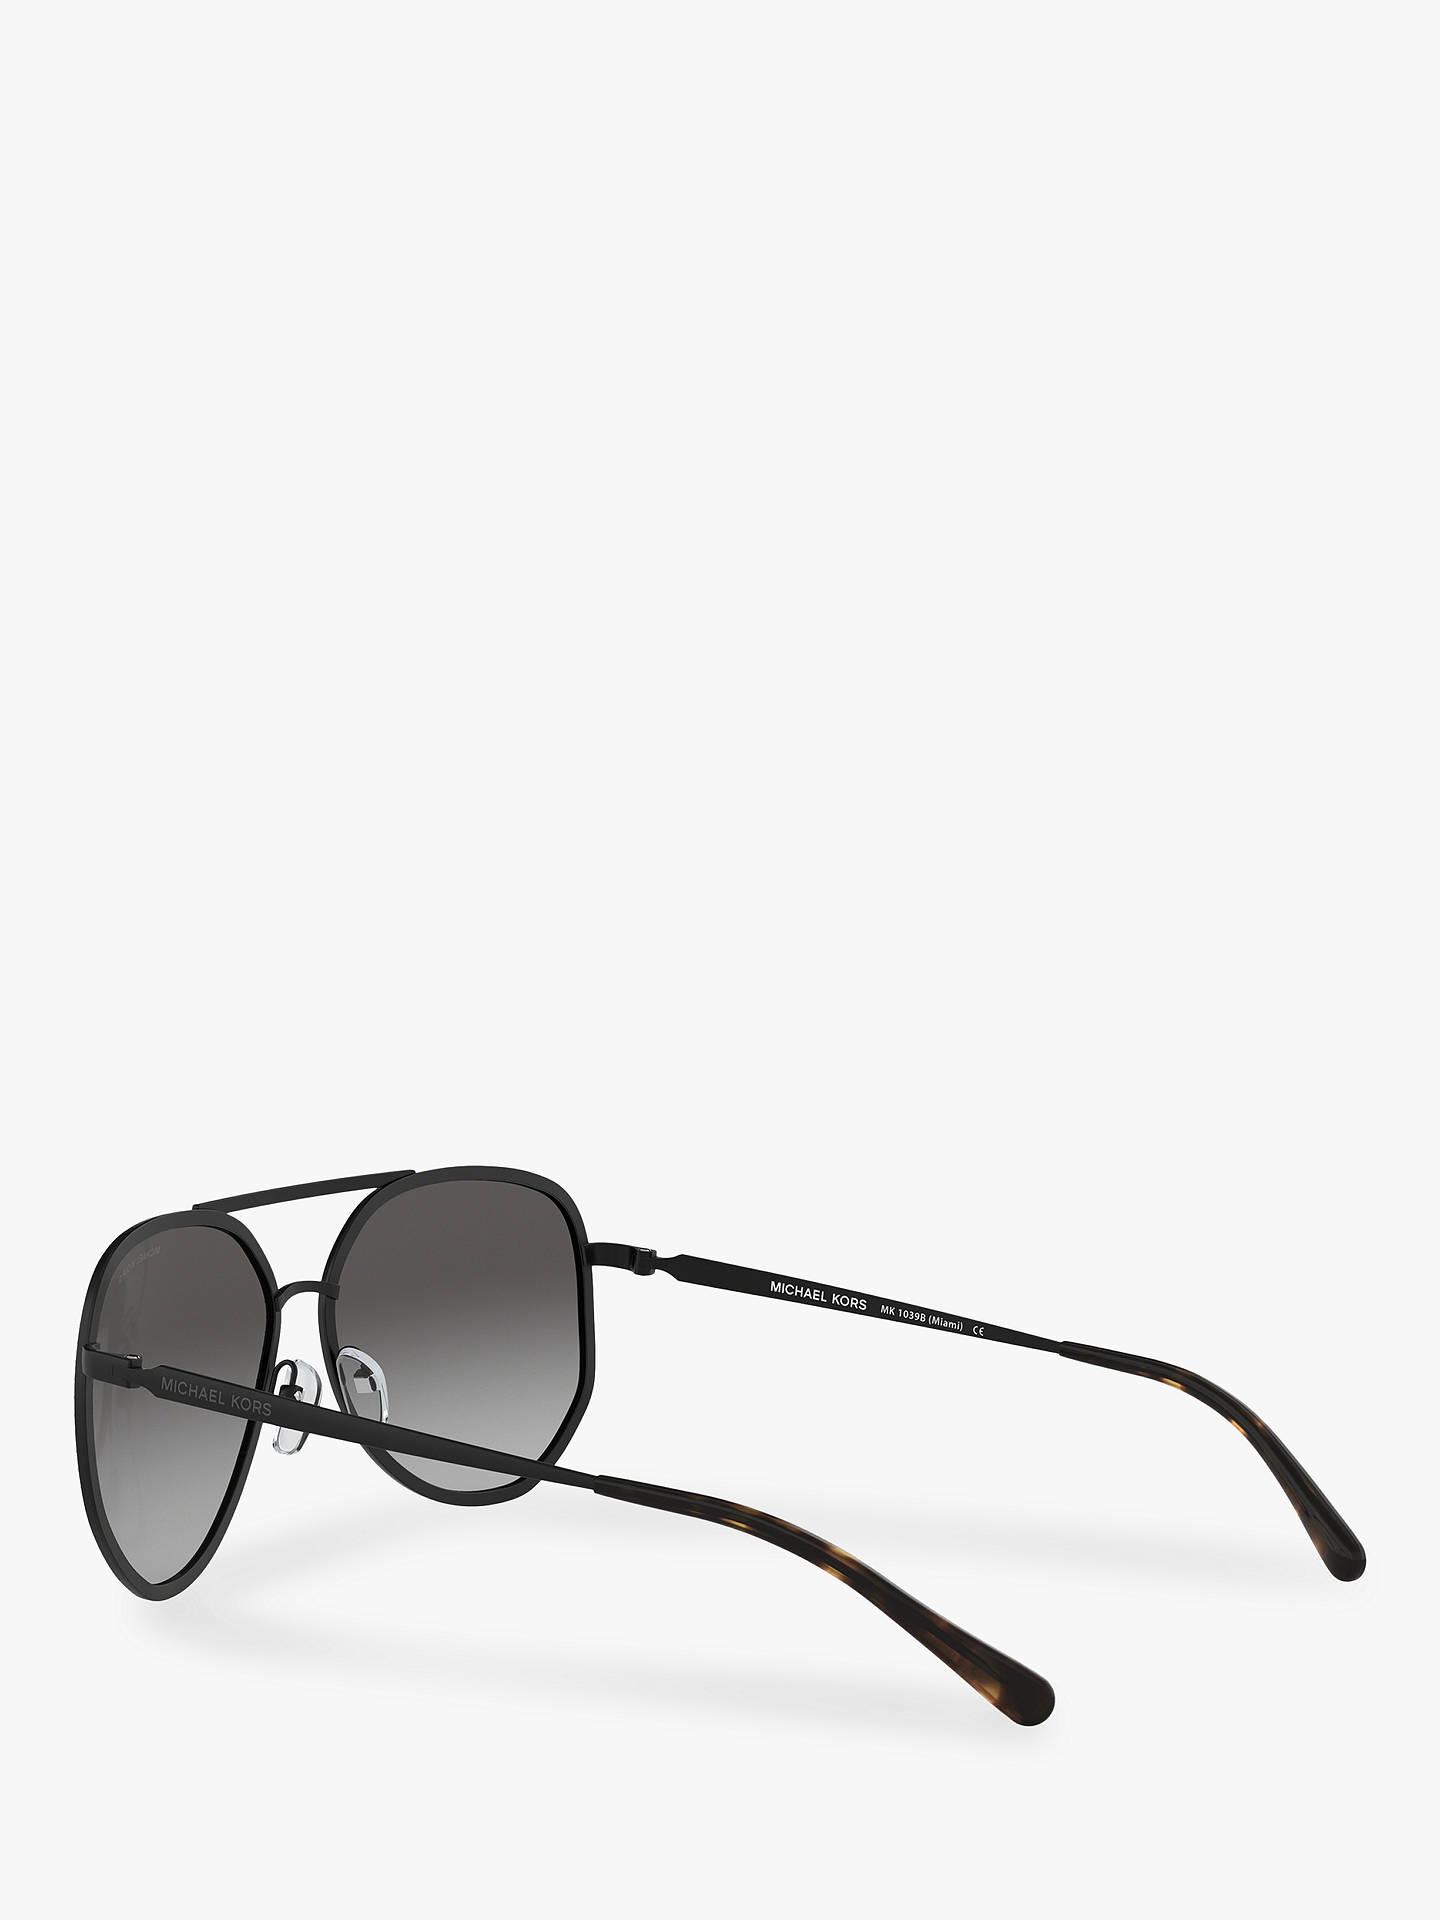 1fc808ab5 ... Buy Michael Kors MK1039B Women's Miami Sunglasses, Matte Black/Grey  Gradient Online at johnlewis ...